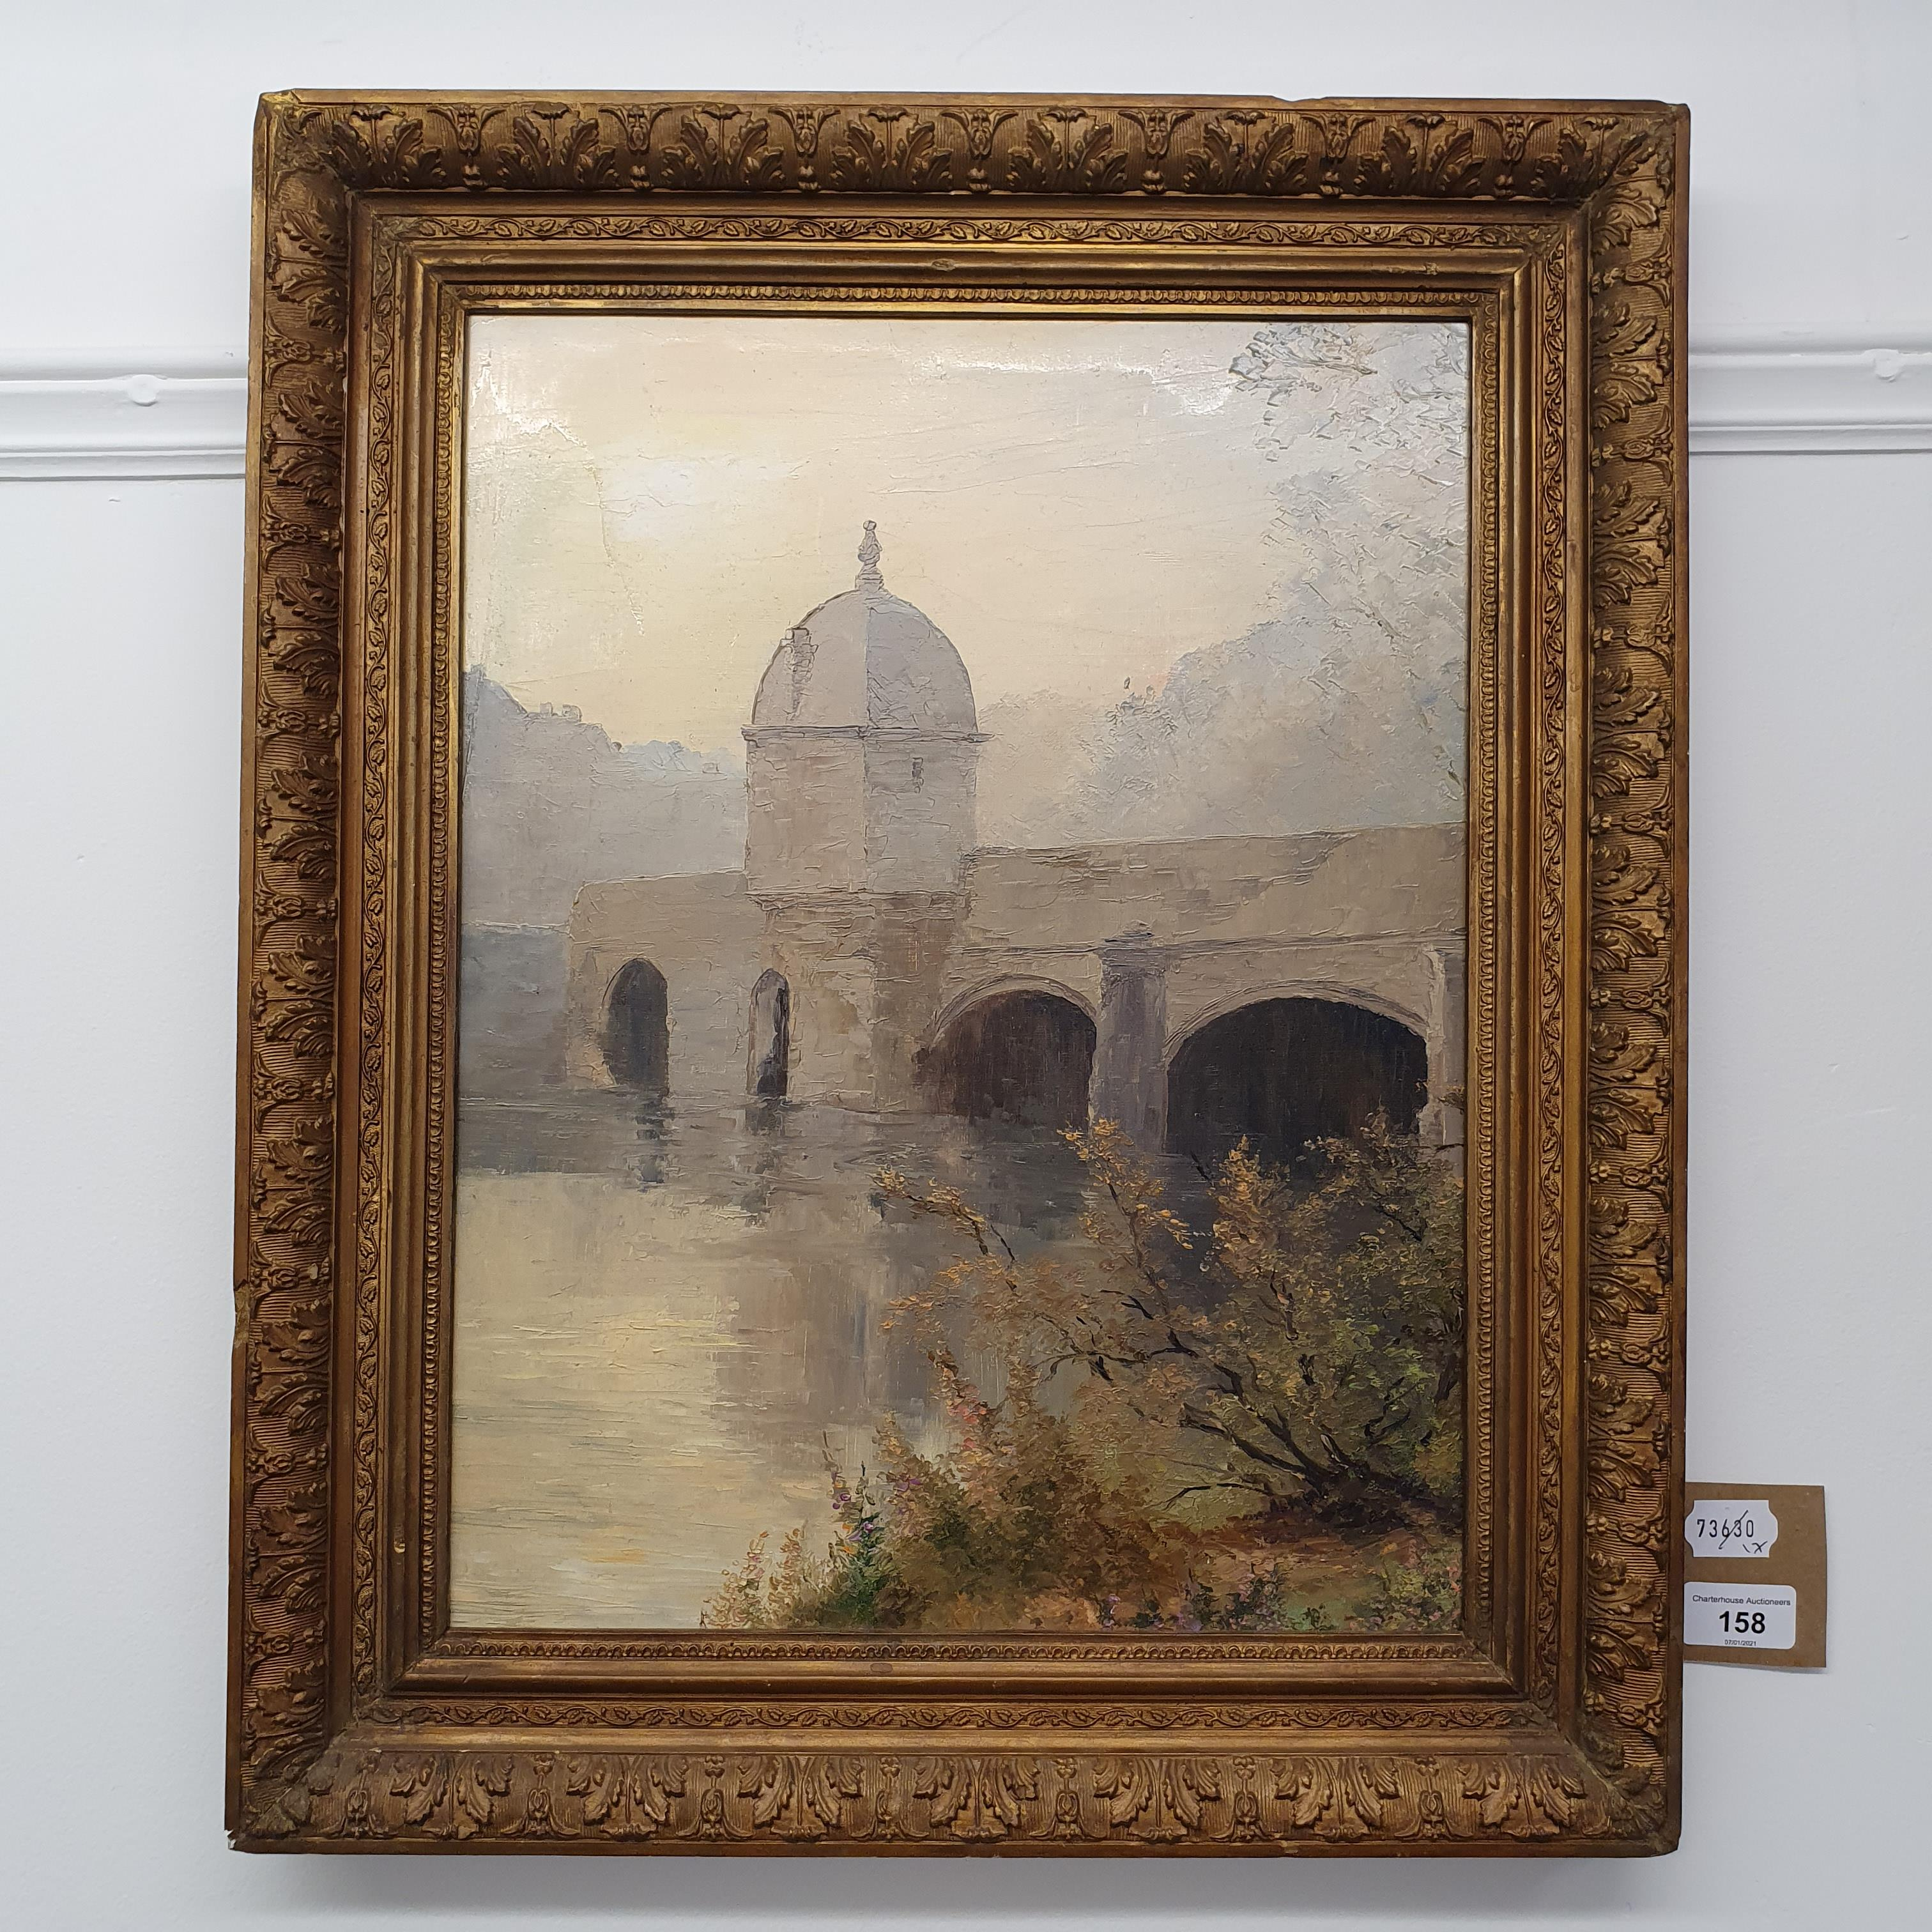 English school, 20th century, a bridge with a turret, oil on board, 43.5 x 33 cm - Image 2 of 3